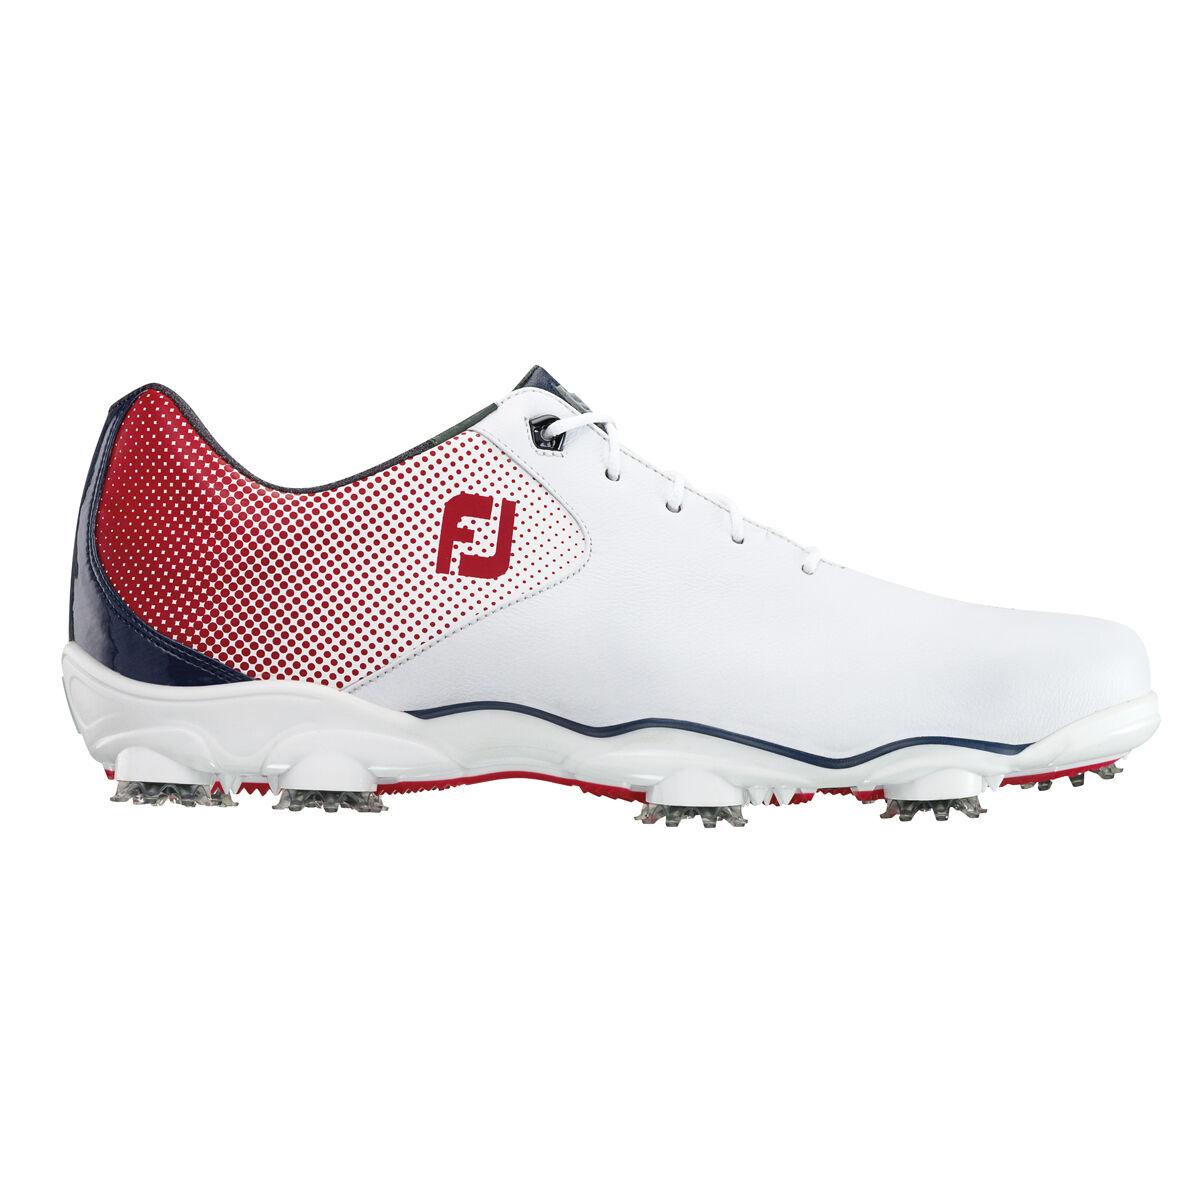 b2af7c07b050 Images. FootJoy D.N.A. Helix Men  39 s Golf Shoe ...